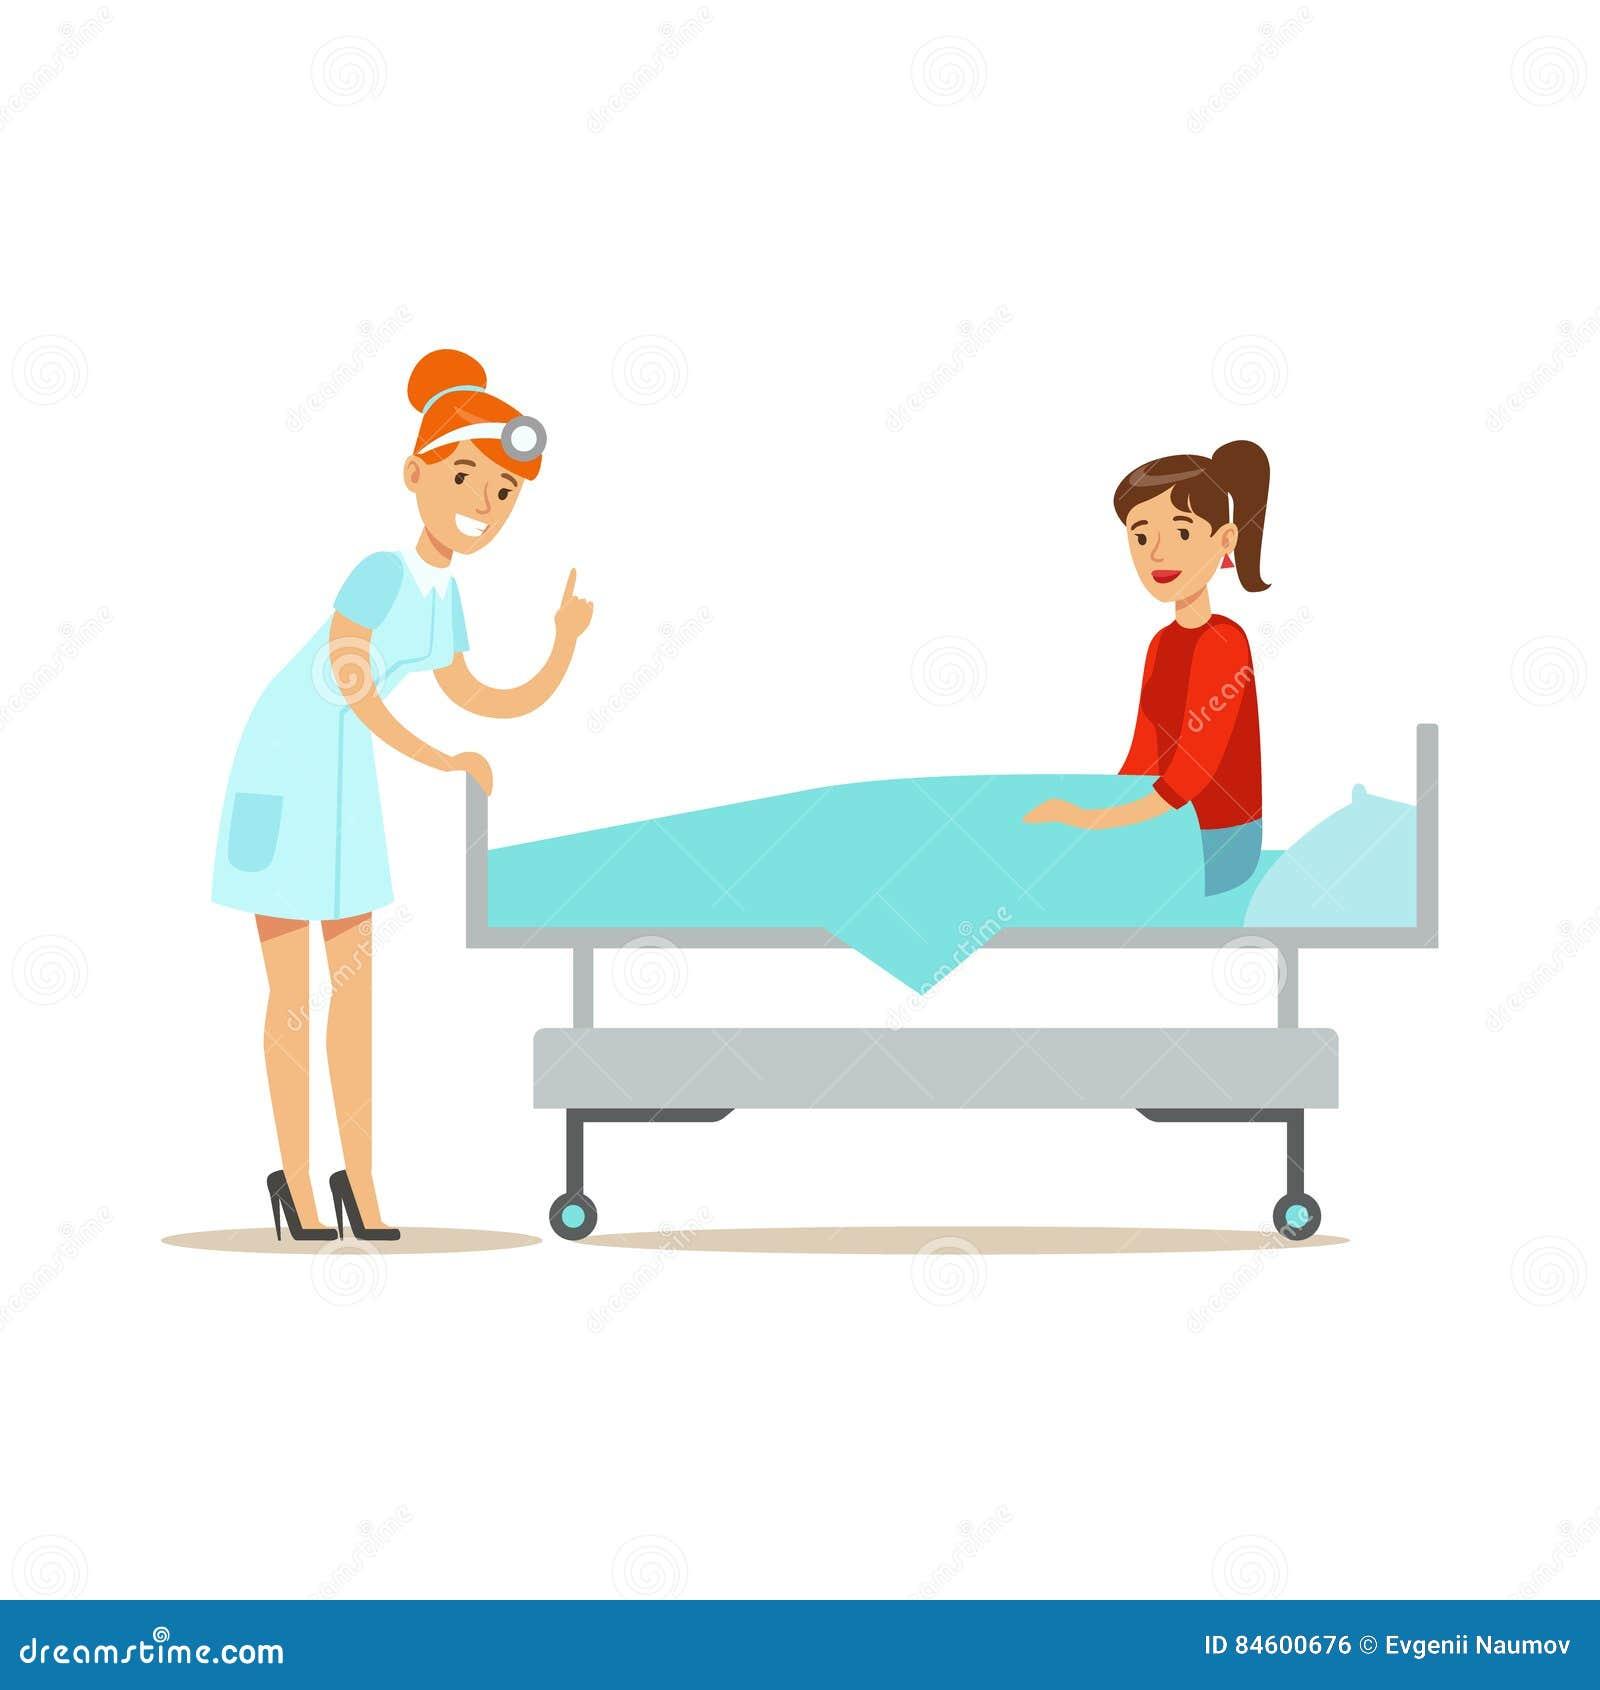 Hospital Bed Illustration Royalty Free Illustration